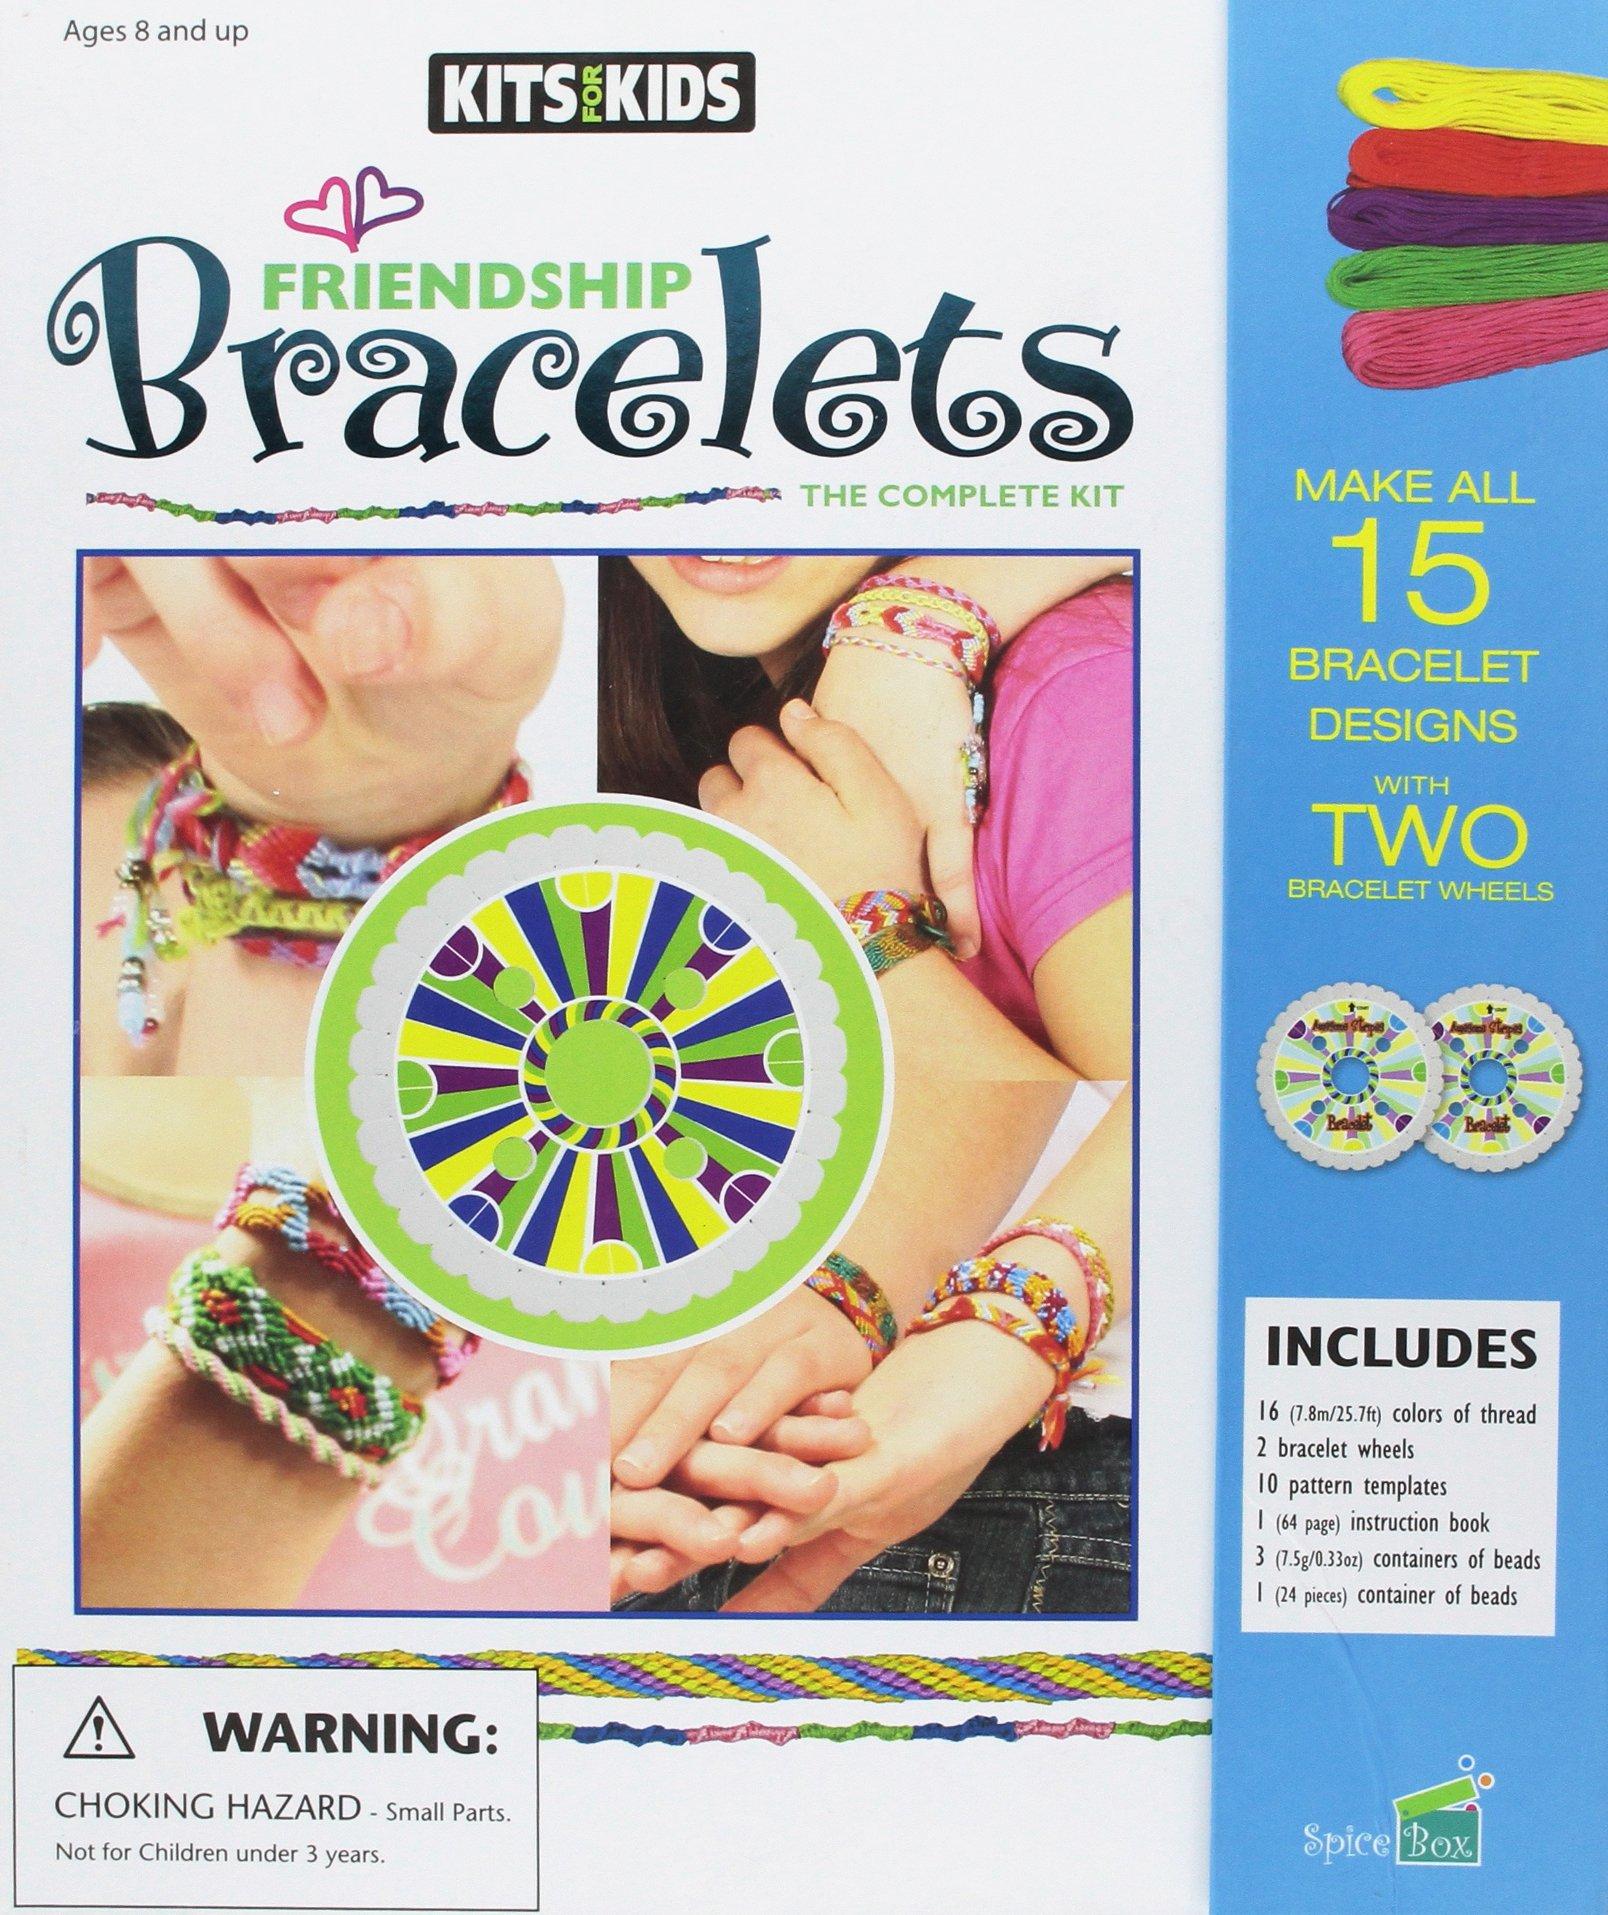 63f7414e69962 Friendship Bracelets (Kits for Kids): Amazon.co.uk: Spicebox ...